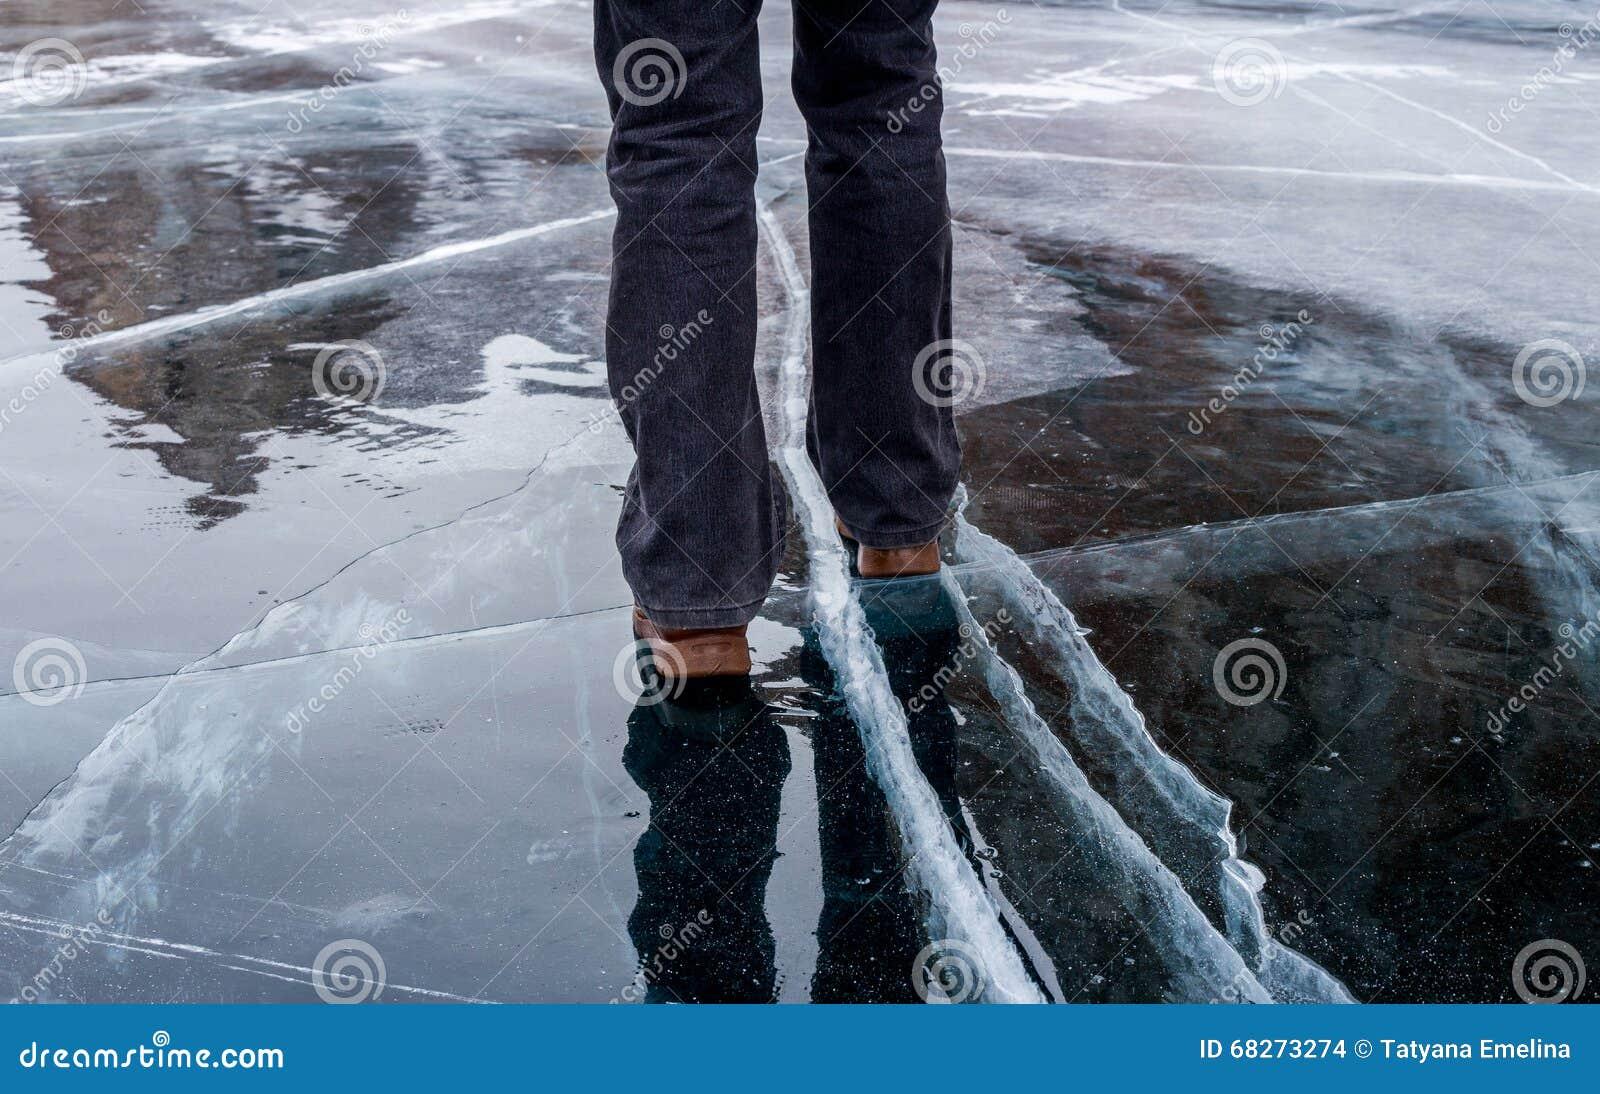 Woman walking on blue cracked ice of frozen lake Baikal.